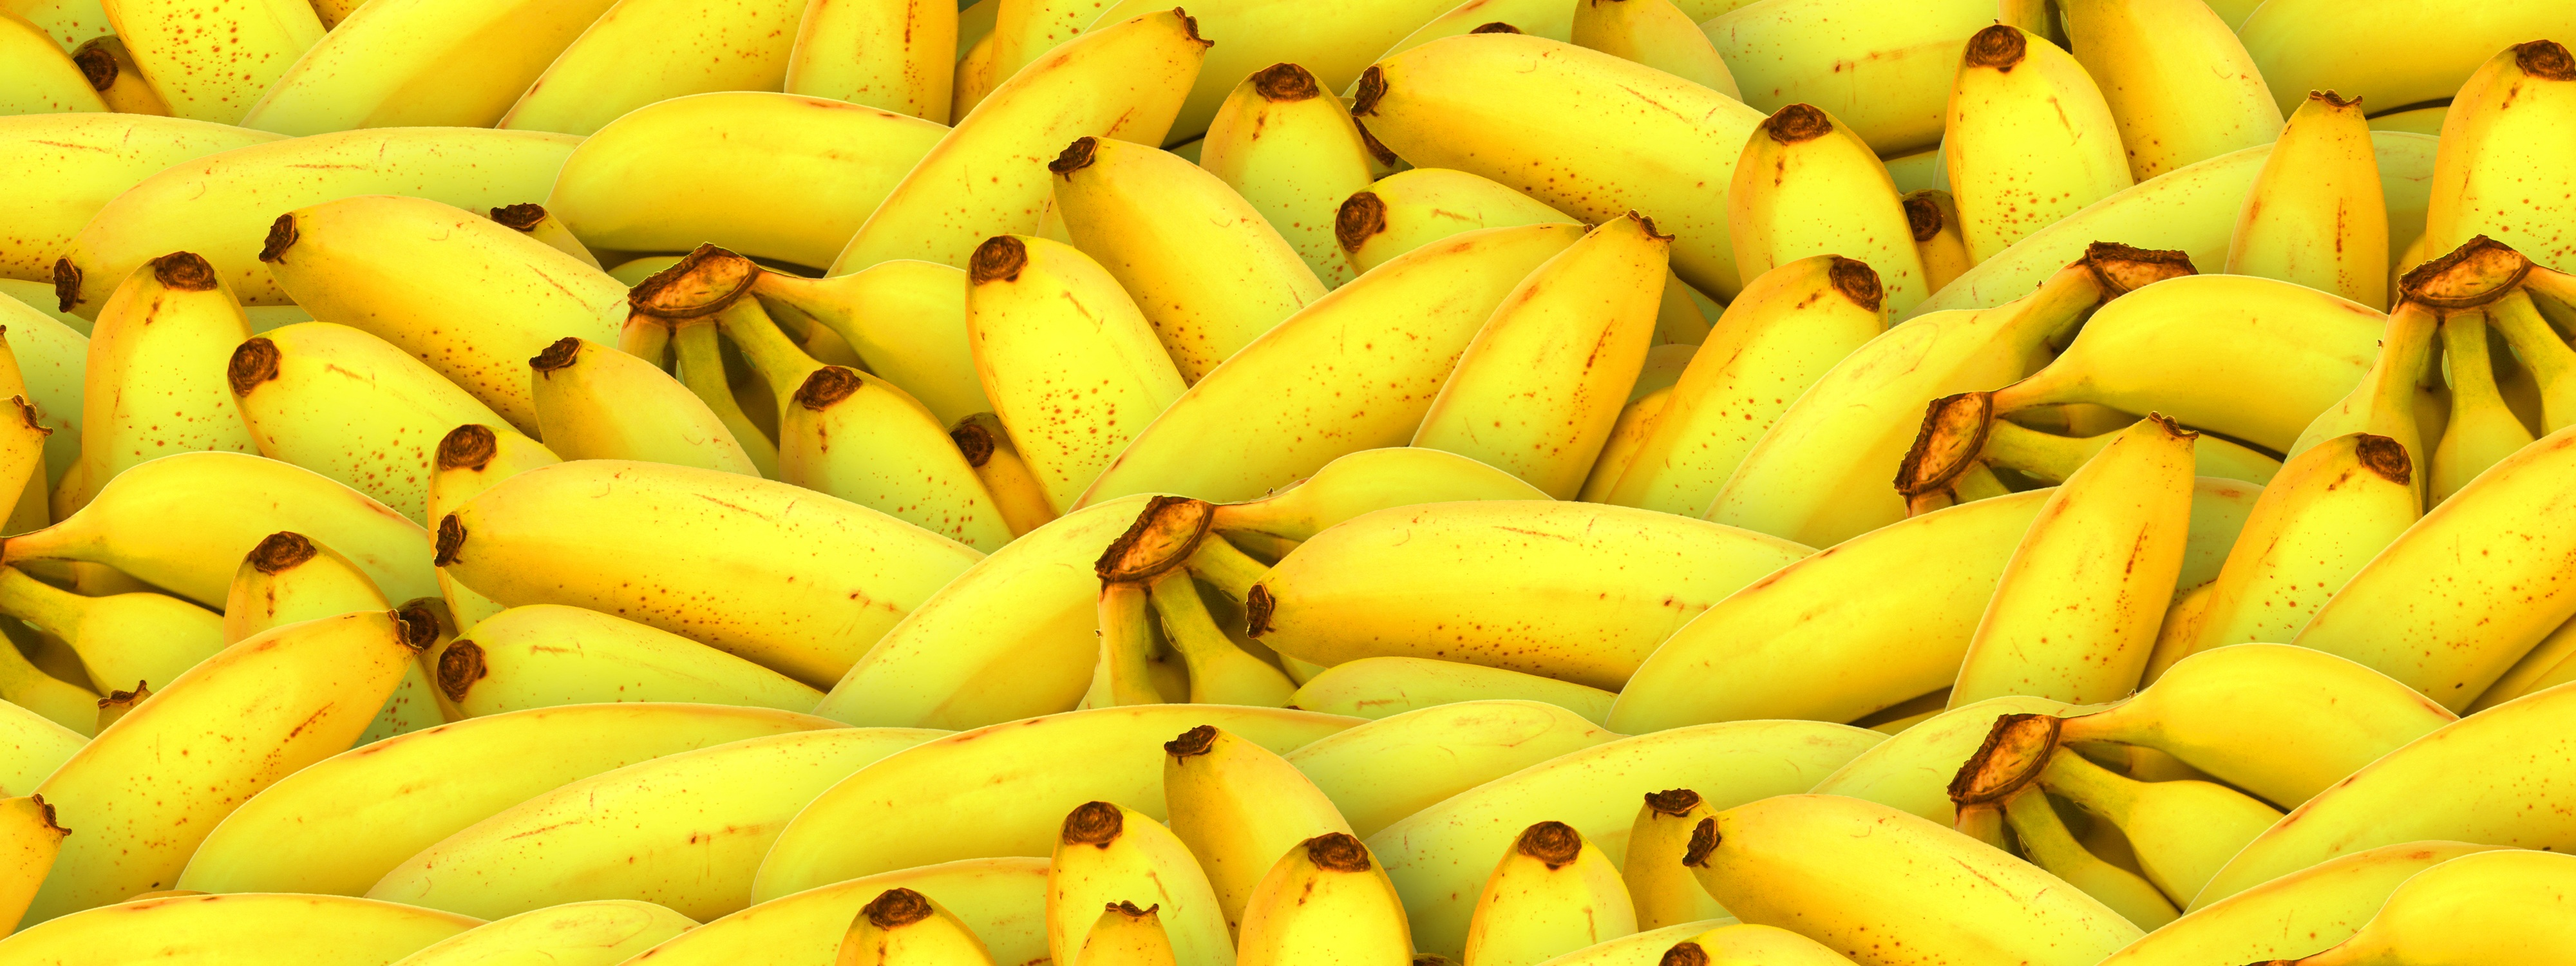 Iphone X Wallpaper Stock Hd Free Stock Photo Of Banana Banner Food